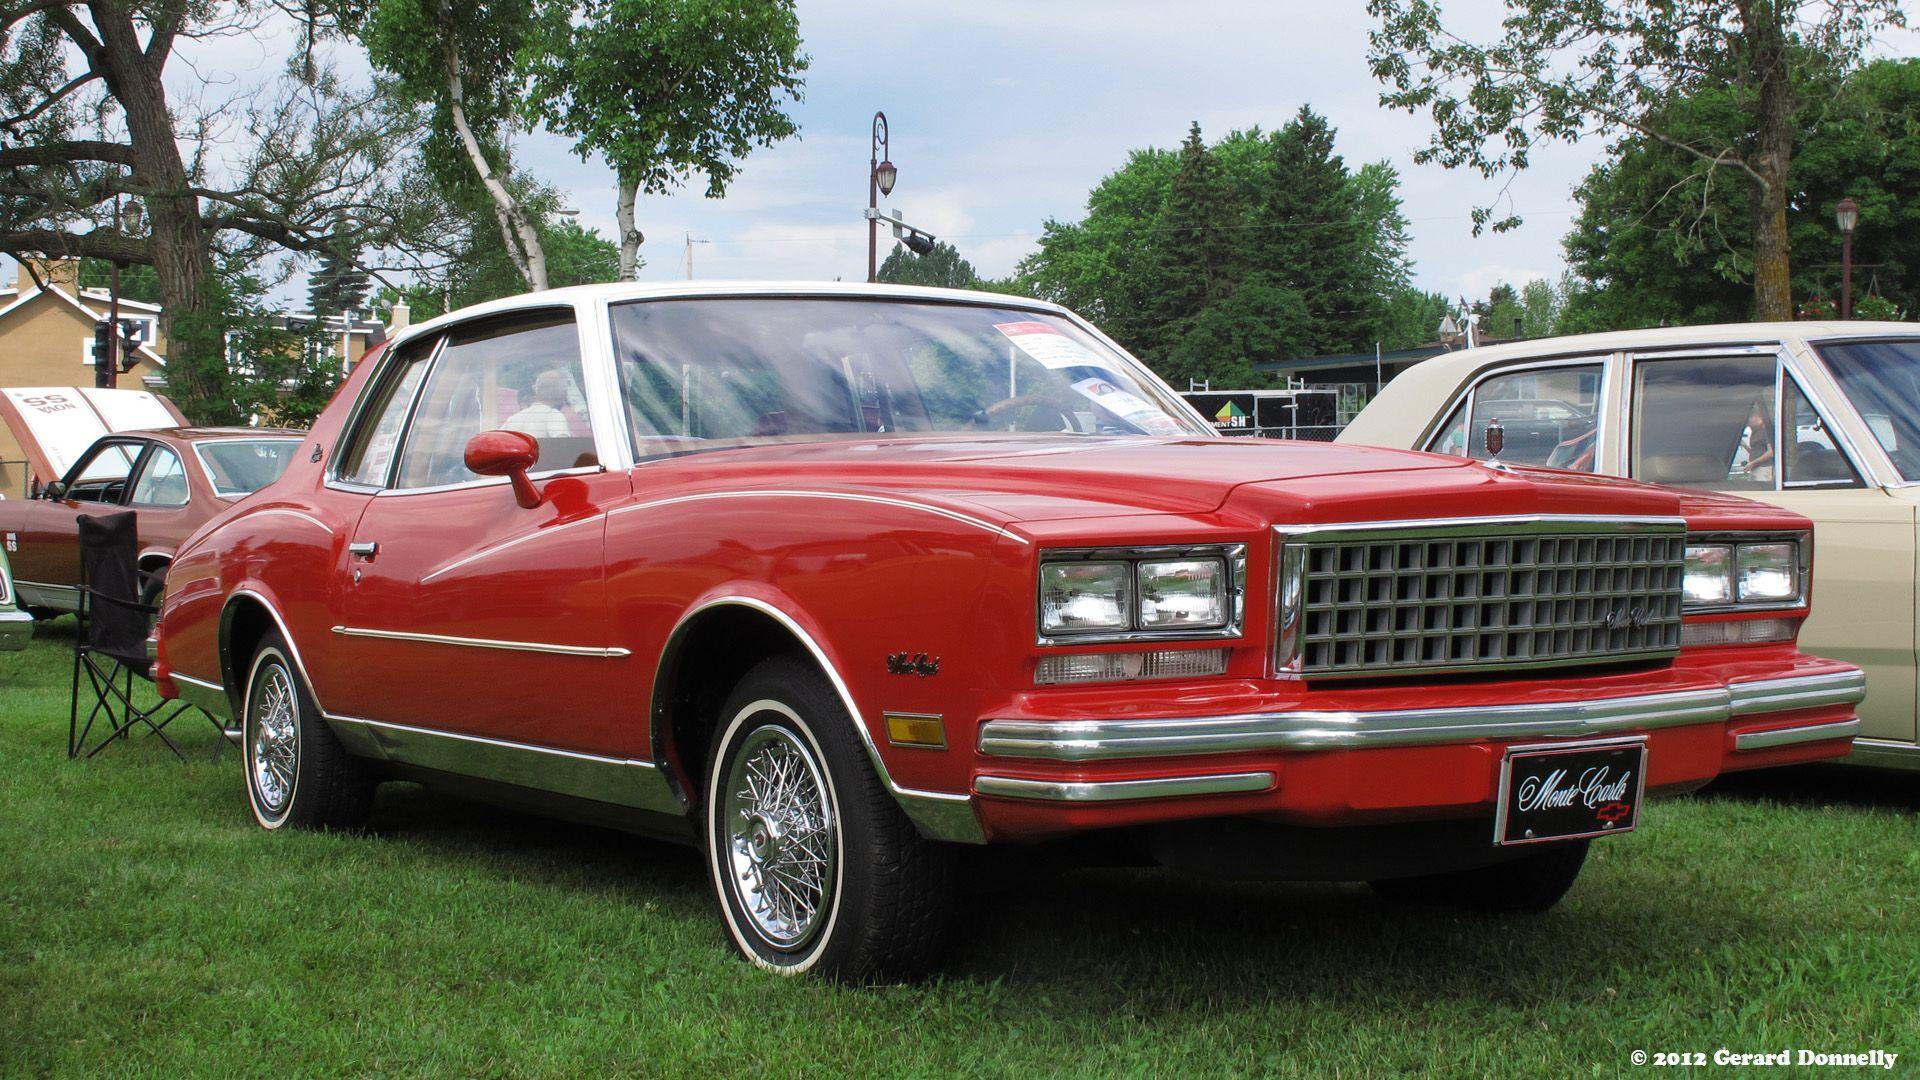 Chevrolet Monte Carlo Chevrolet Monte Carlo Monte Carlo Chevrolet